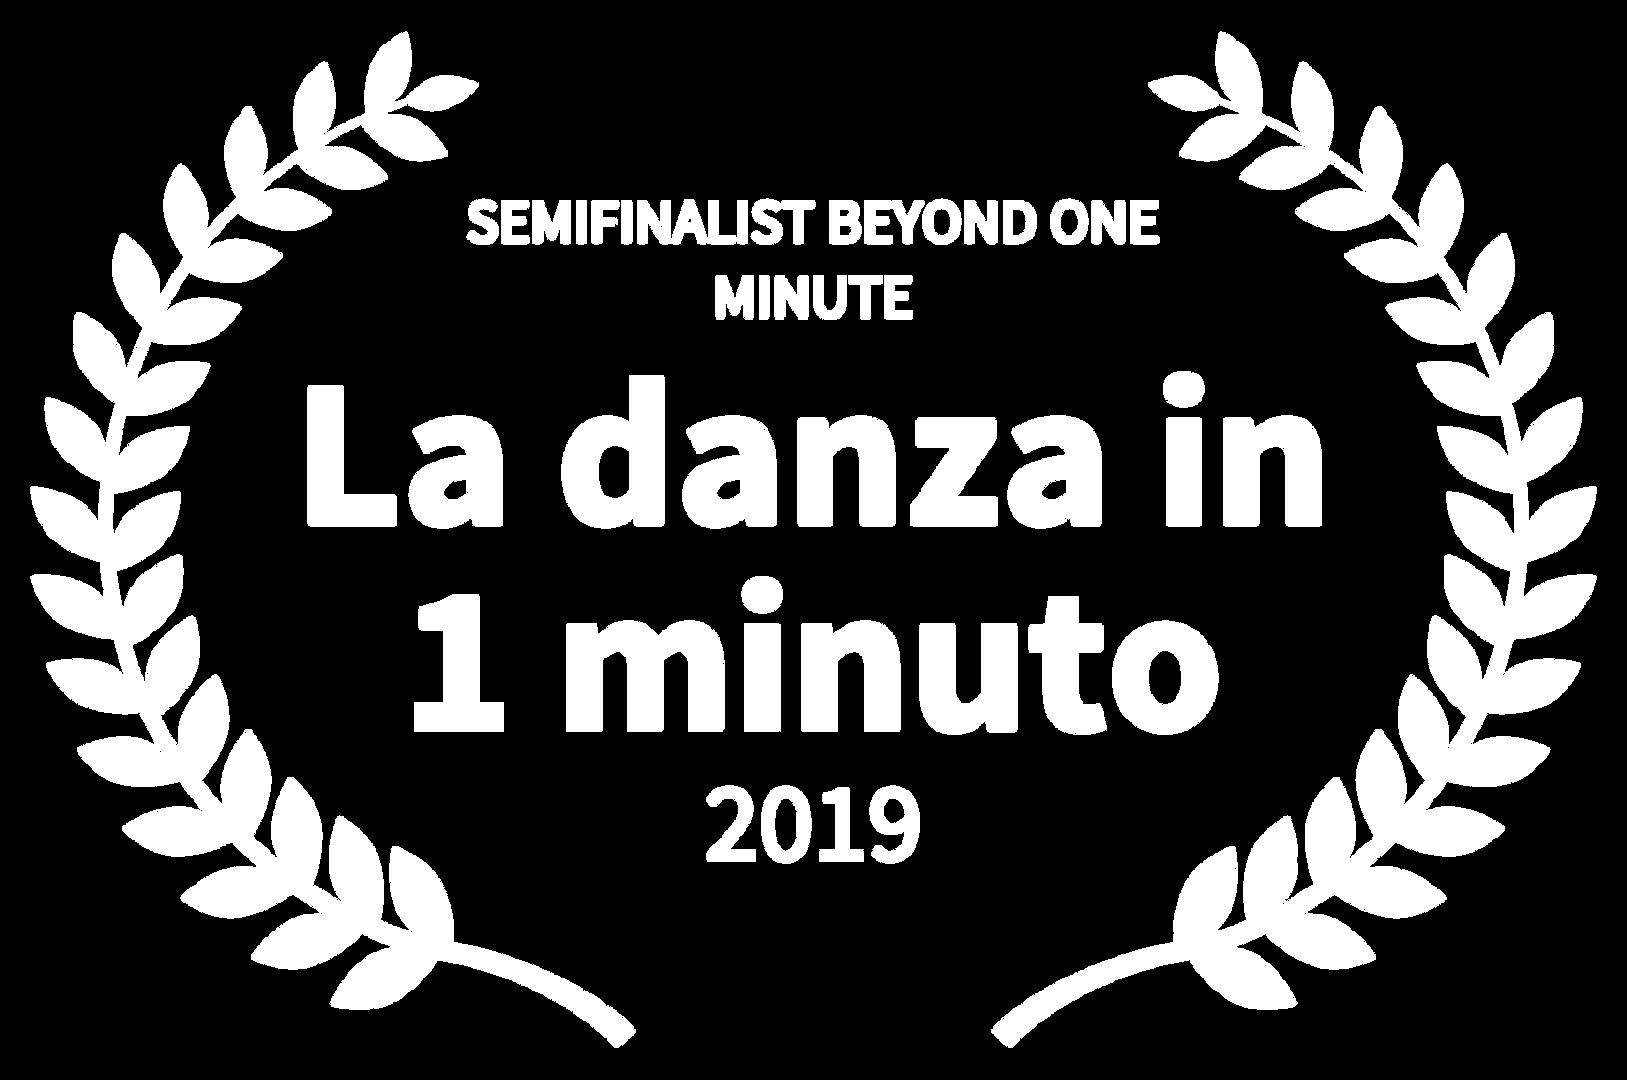 SEMIFINALIST BEYOND ONE MINUTE - La danz